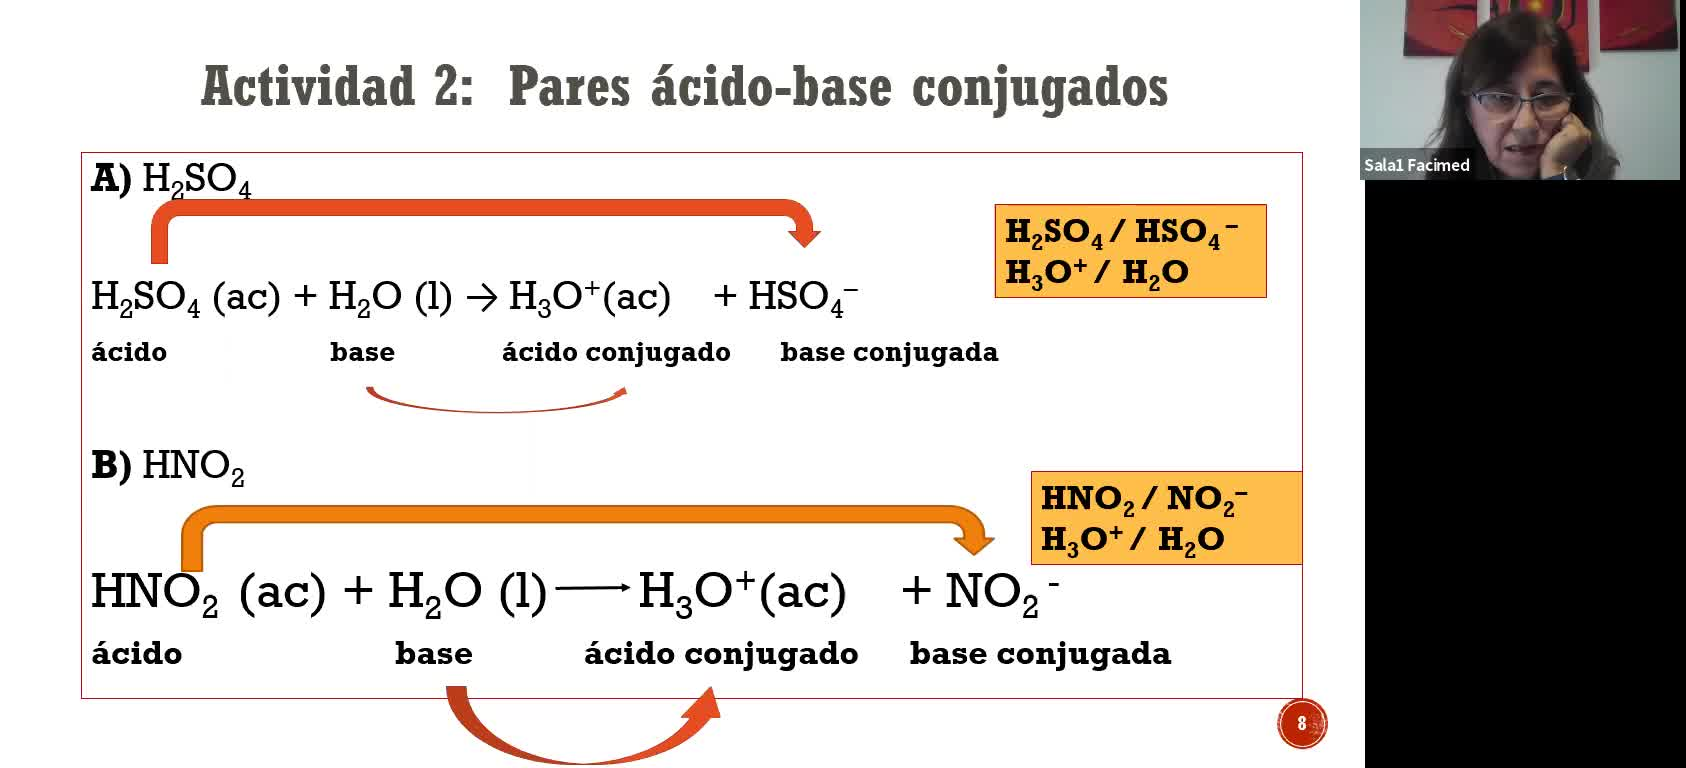 IQSB-FACIMED Clase de consulta GUIA 7